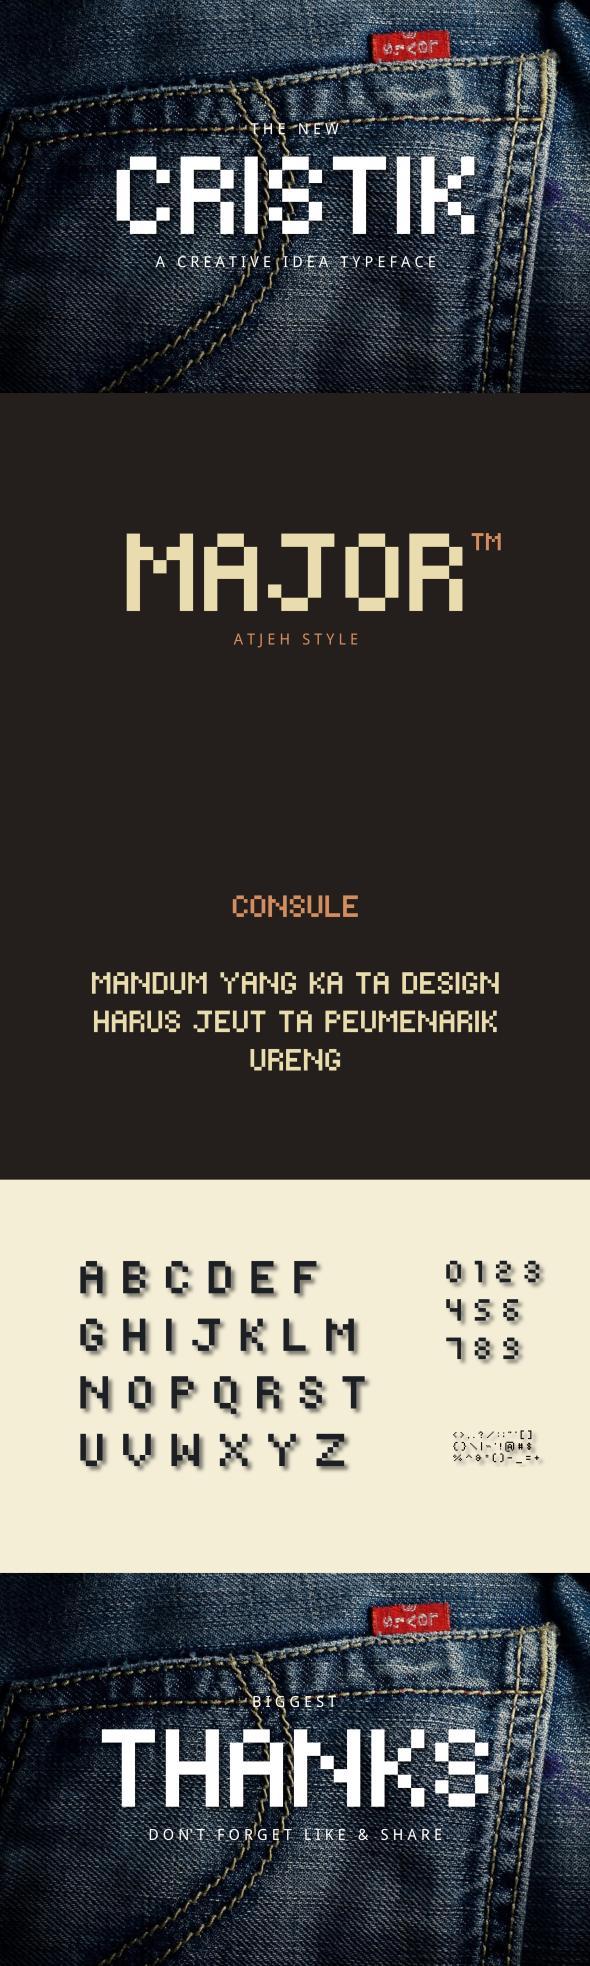 Cristik | A Creative Type - Sans-Serif Fonts